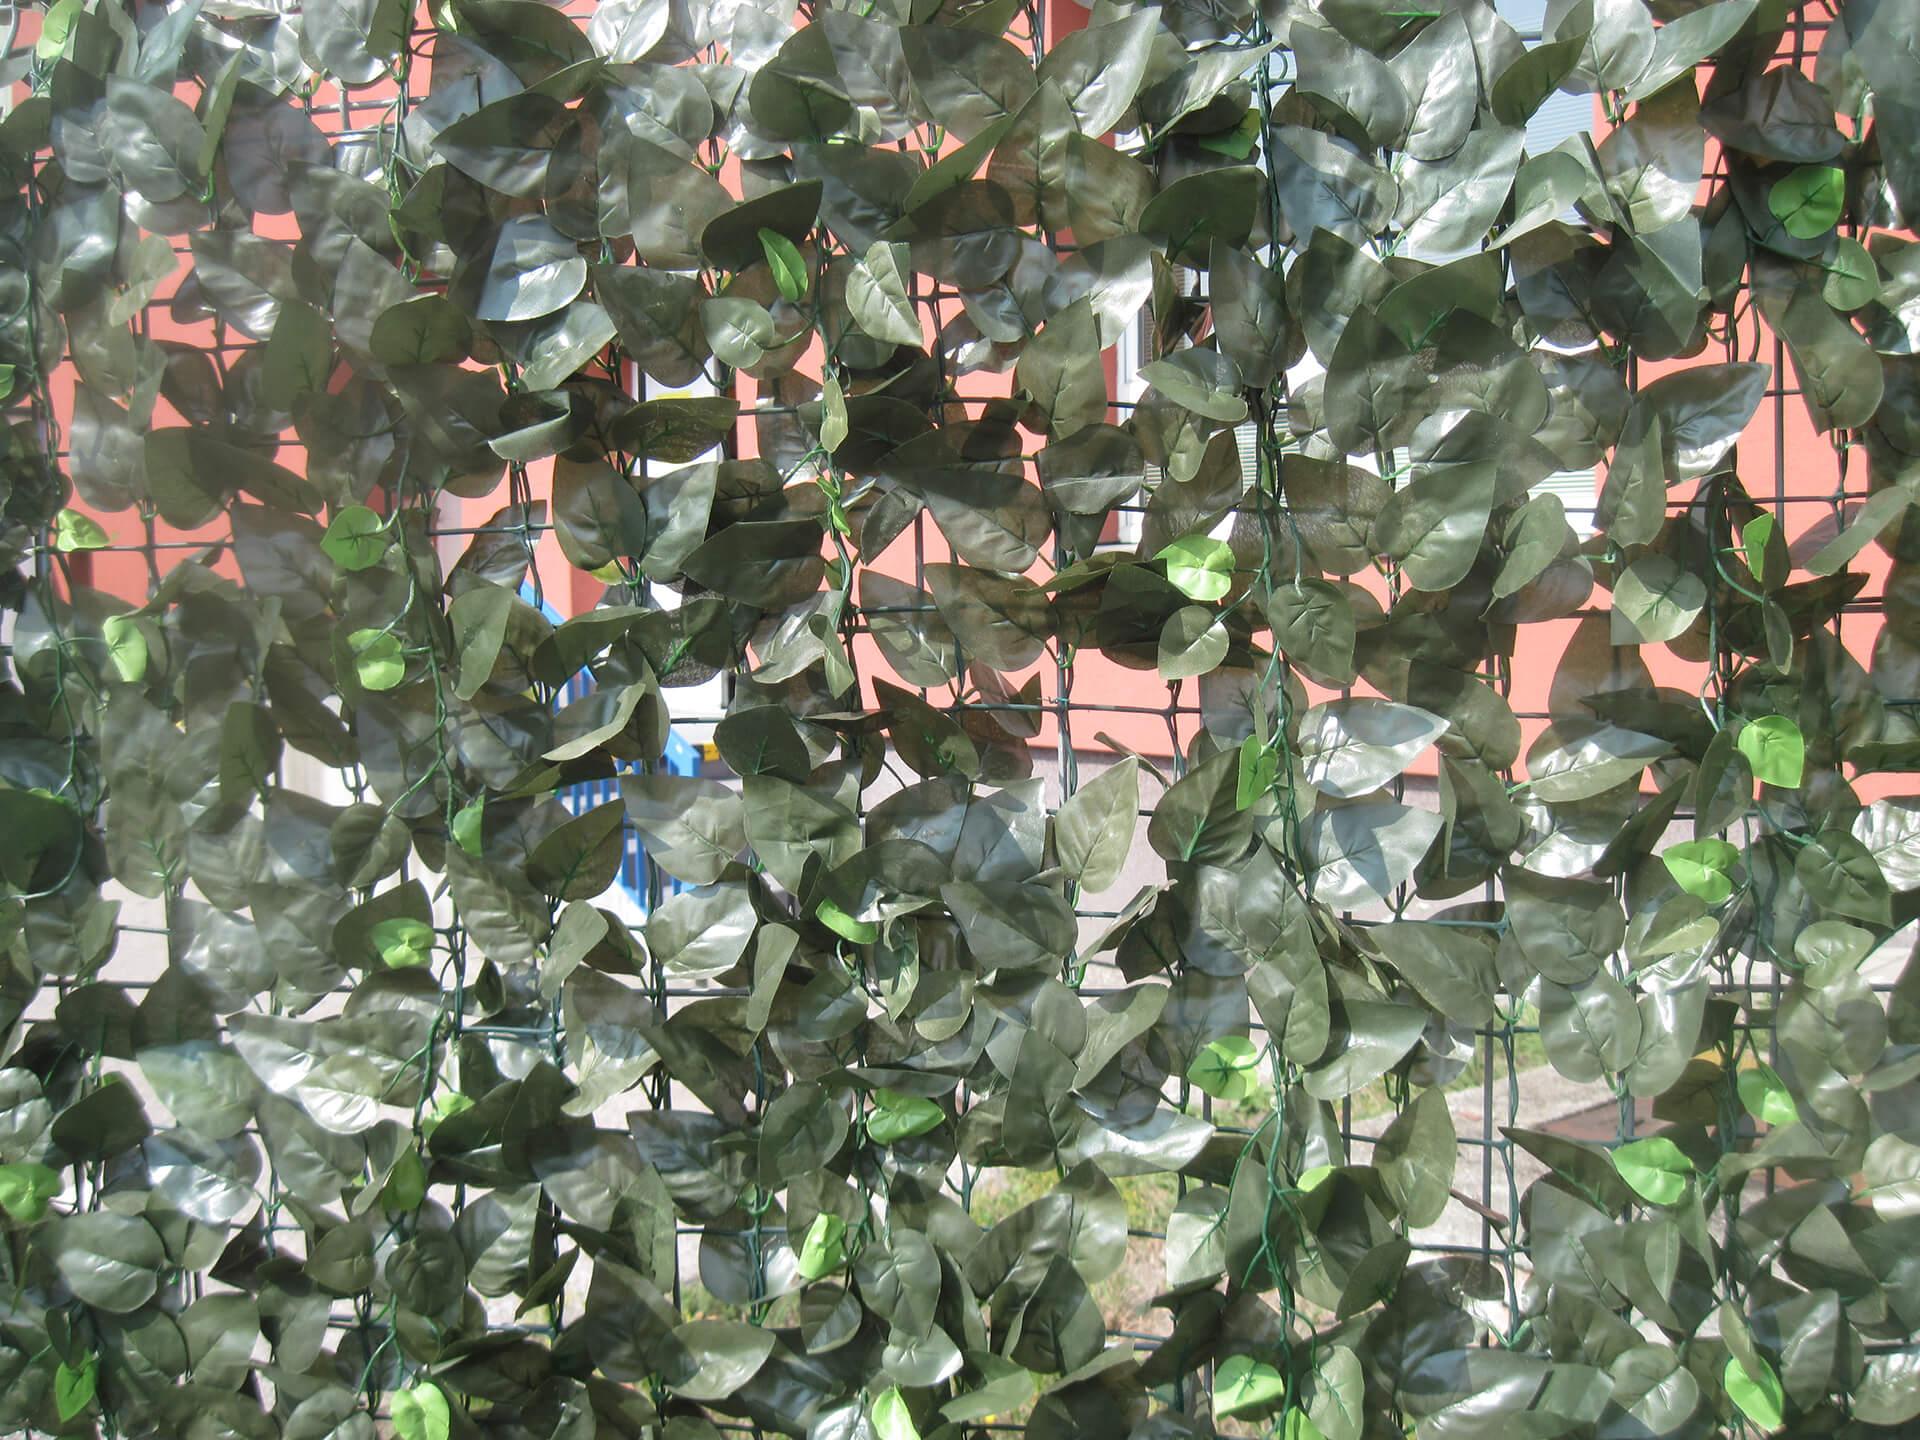 Dekorace zahrad, umělý živý plot - prodej eshop Ostrava